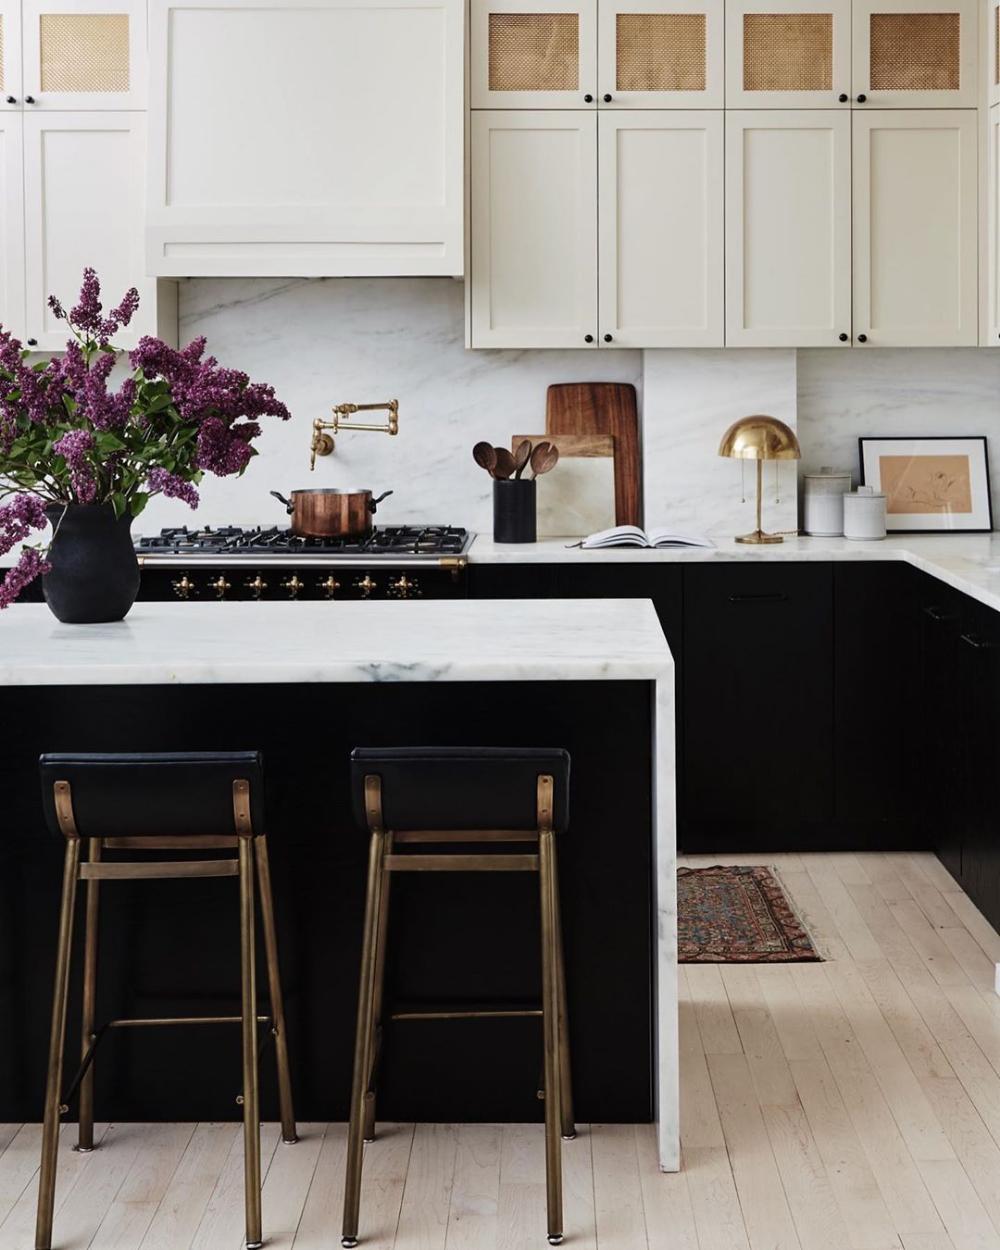 Fall Decor Ideas 2019 Bedroom Decor Ideas Nz Decor Ideas Reddit Bathroom Decor Ideas Modern Ideas To D Kitchen Inspirations Home Kitchens Kitchen Interior